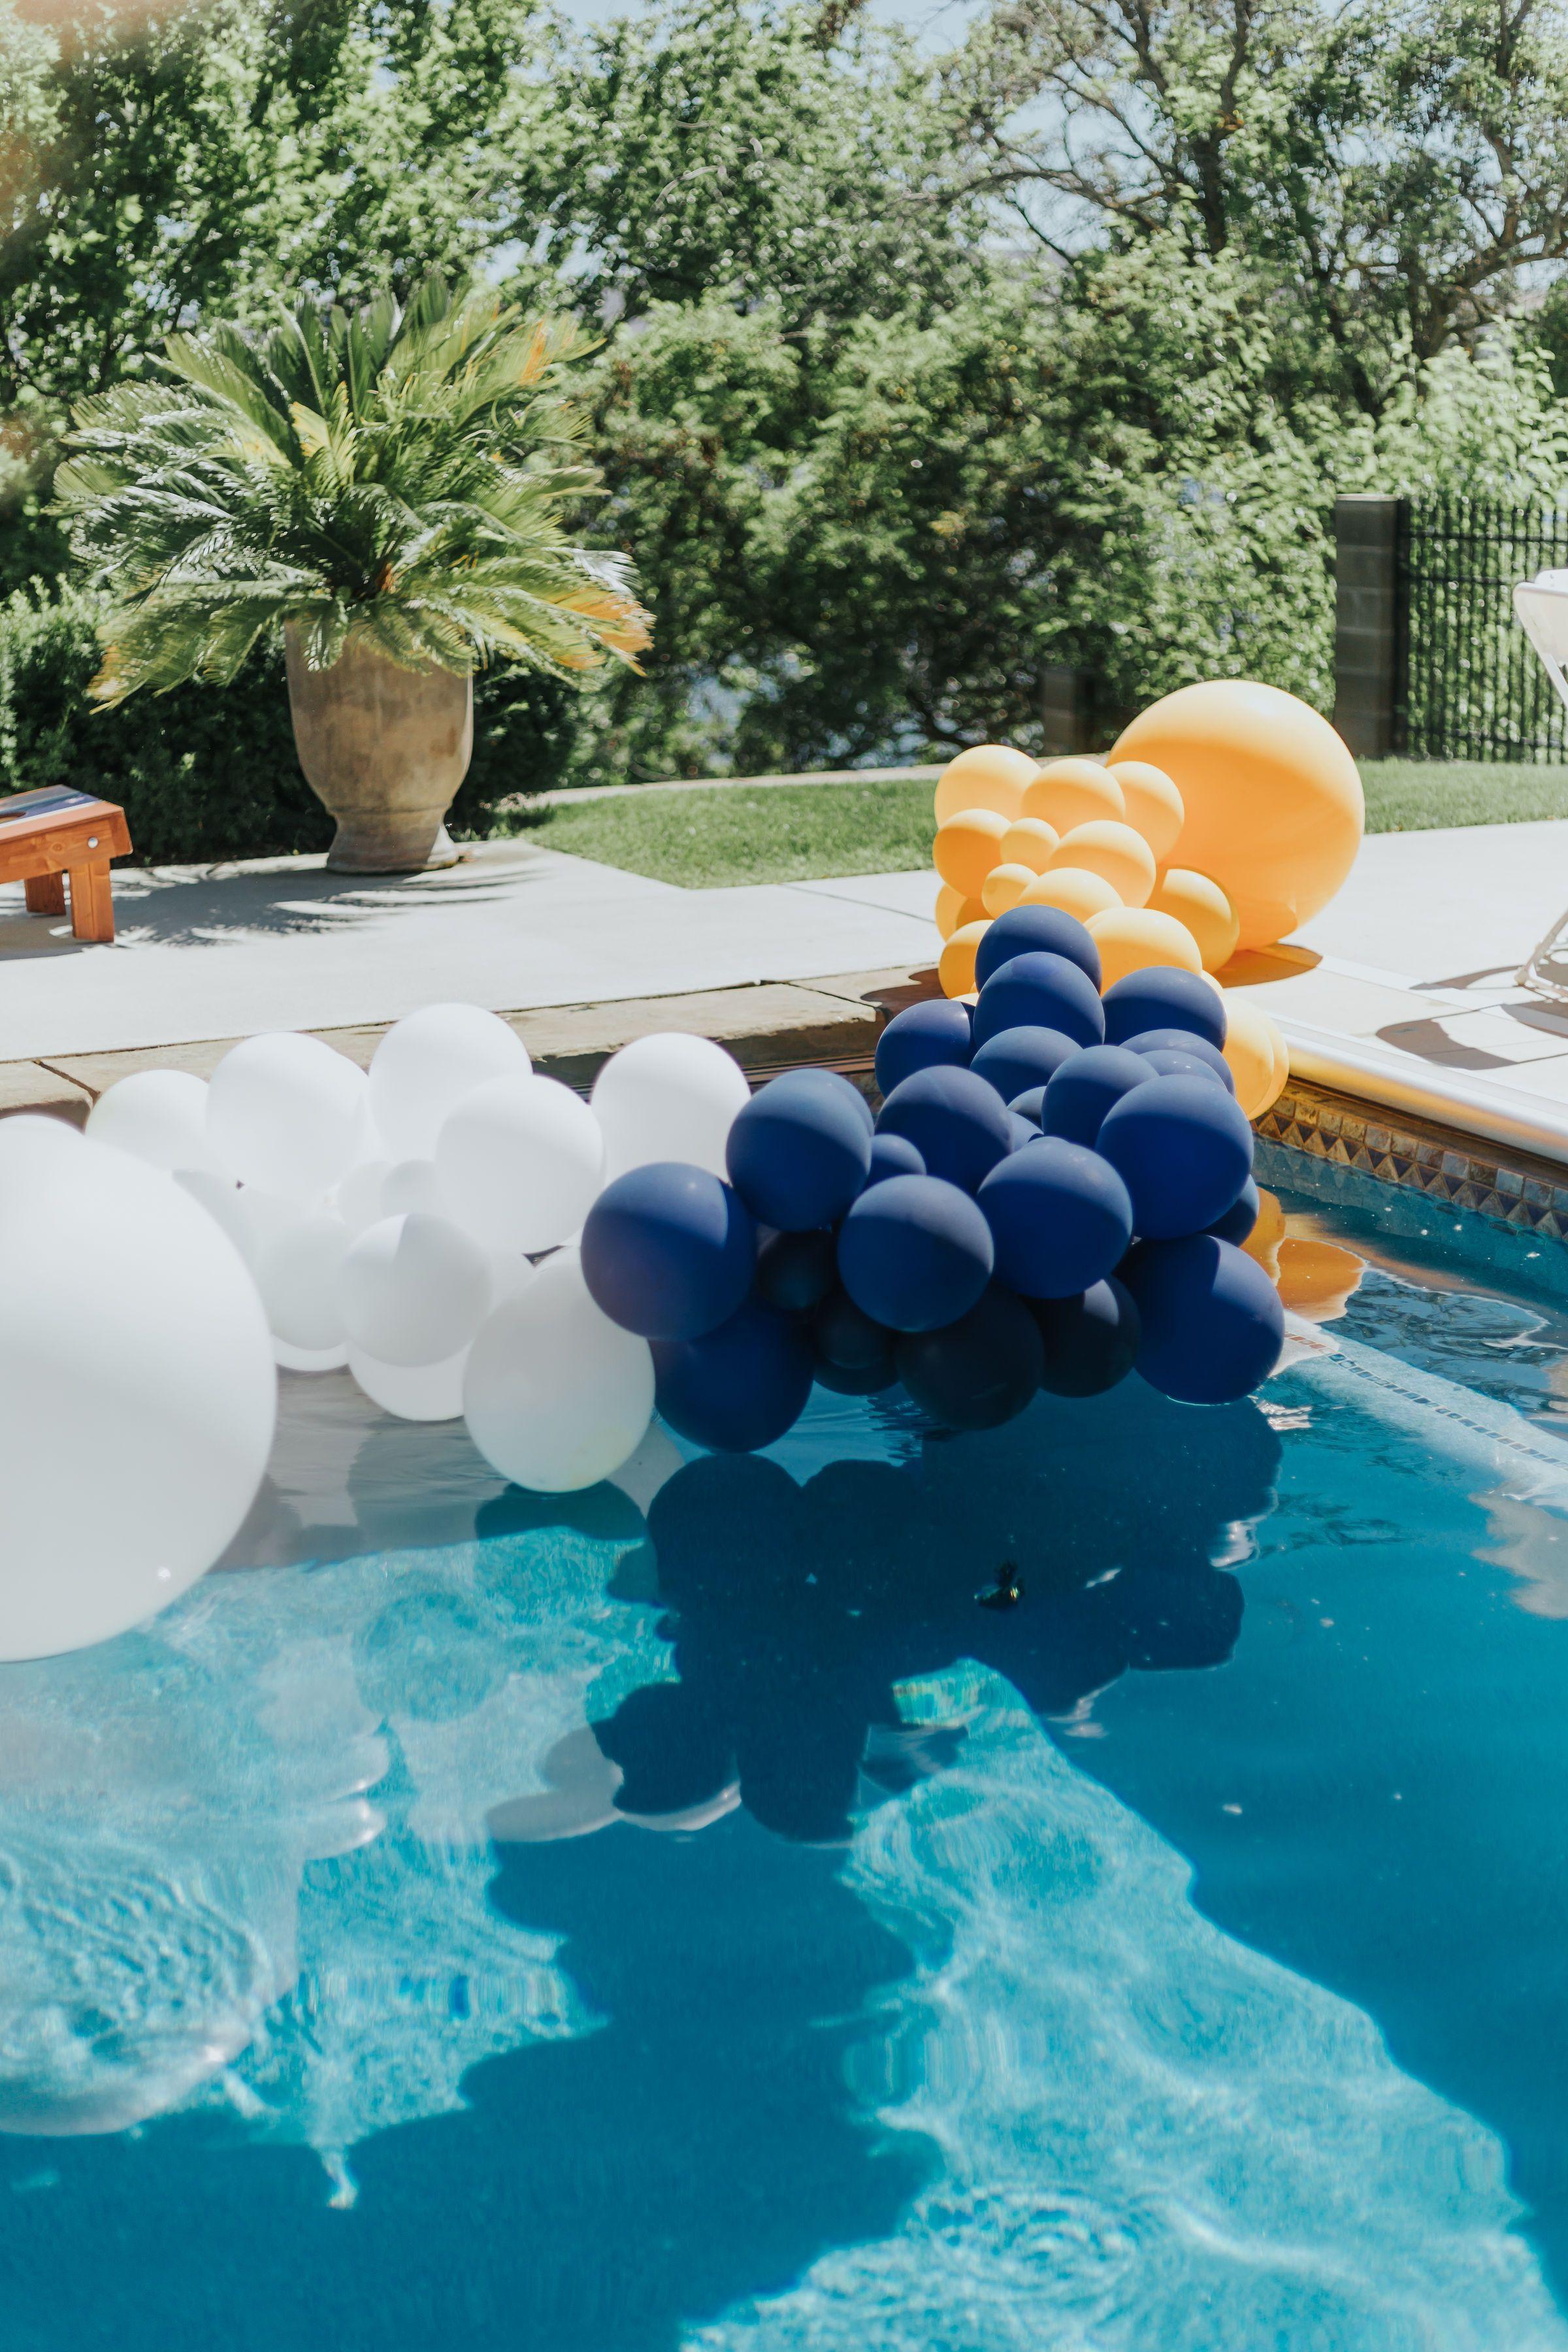 Pool Balloon Garland Balloon Garland Pool Party Decorations